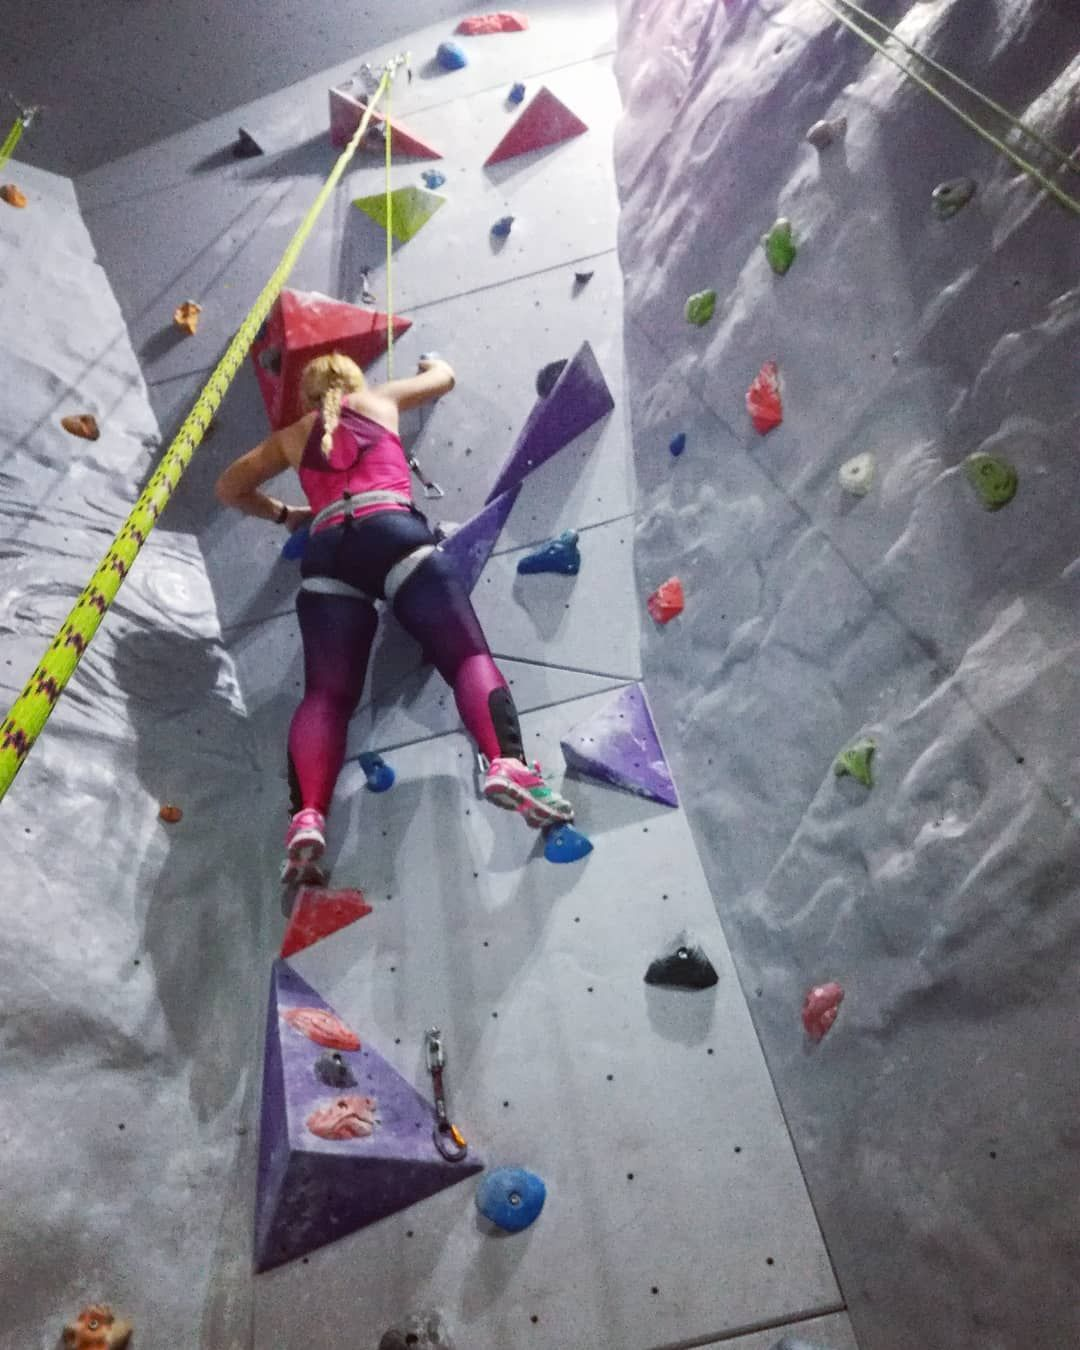 Blondyna Sie Wspina Polishgirl Climbing Power